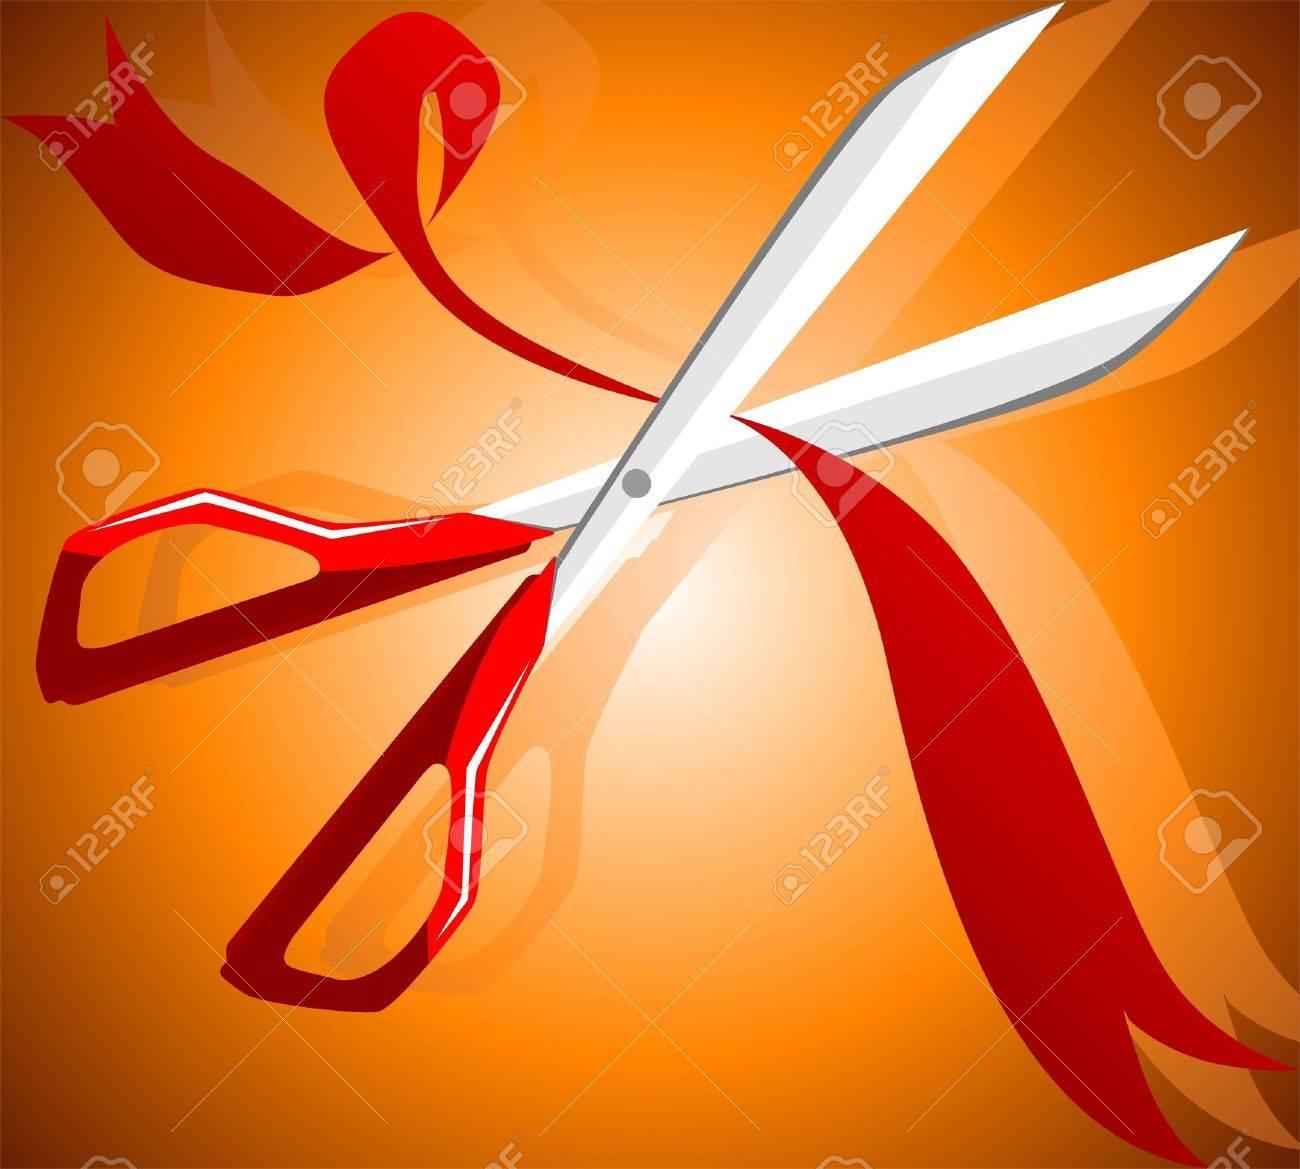 Illustration of a scissors cutting a ribbon Stock Illustration - 3966979